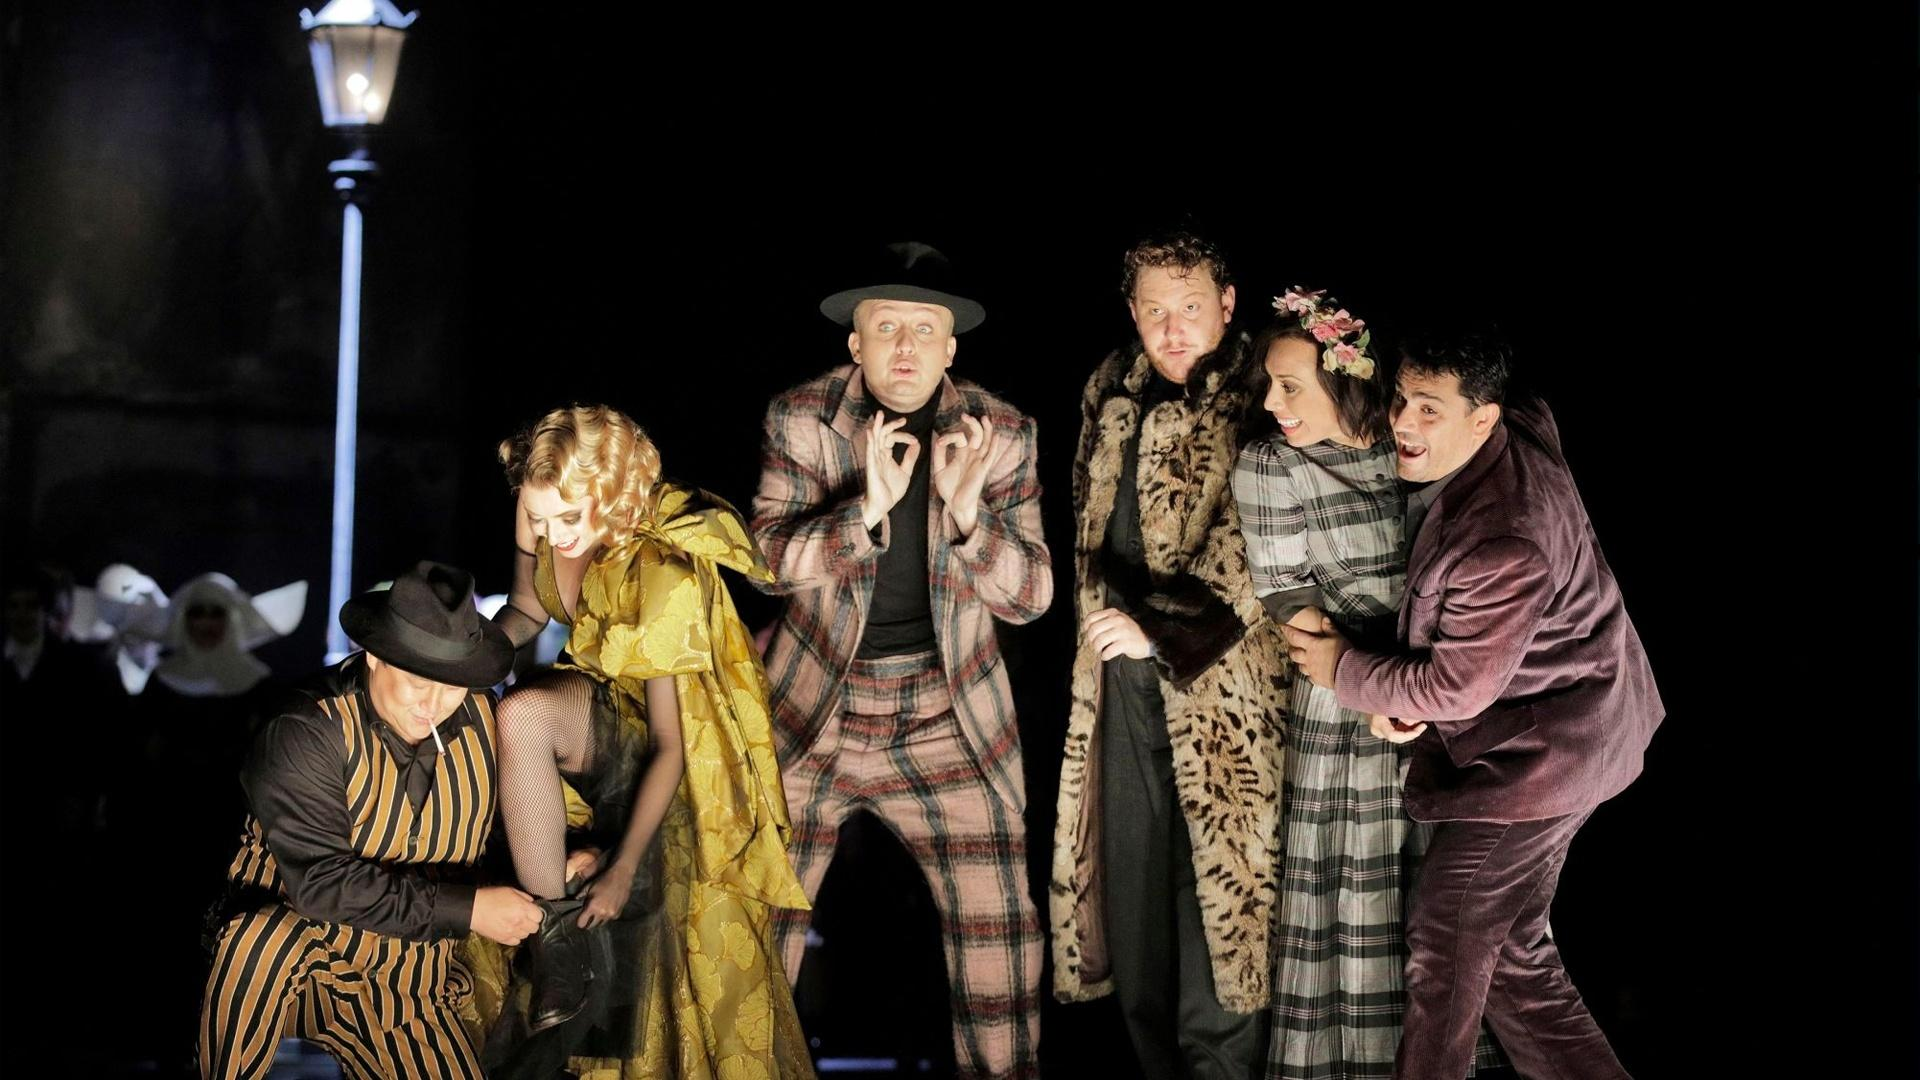 LA Opera's production of La bohème